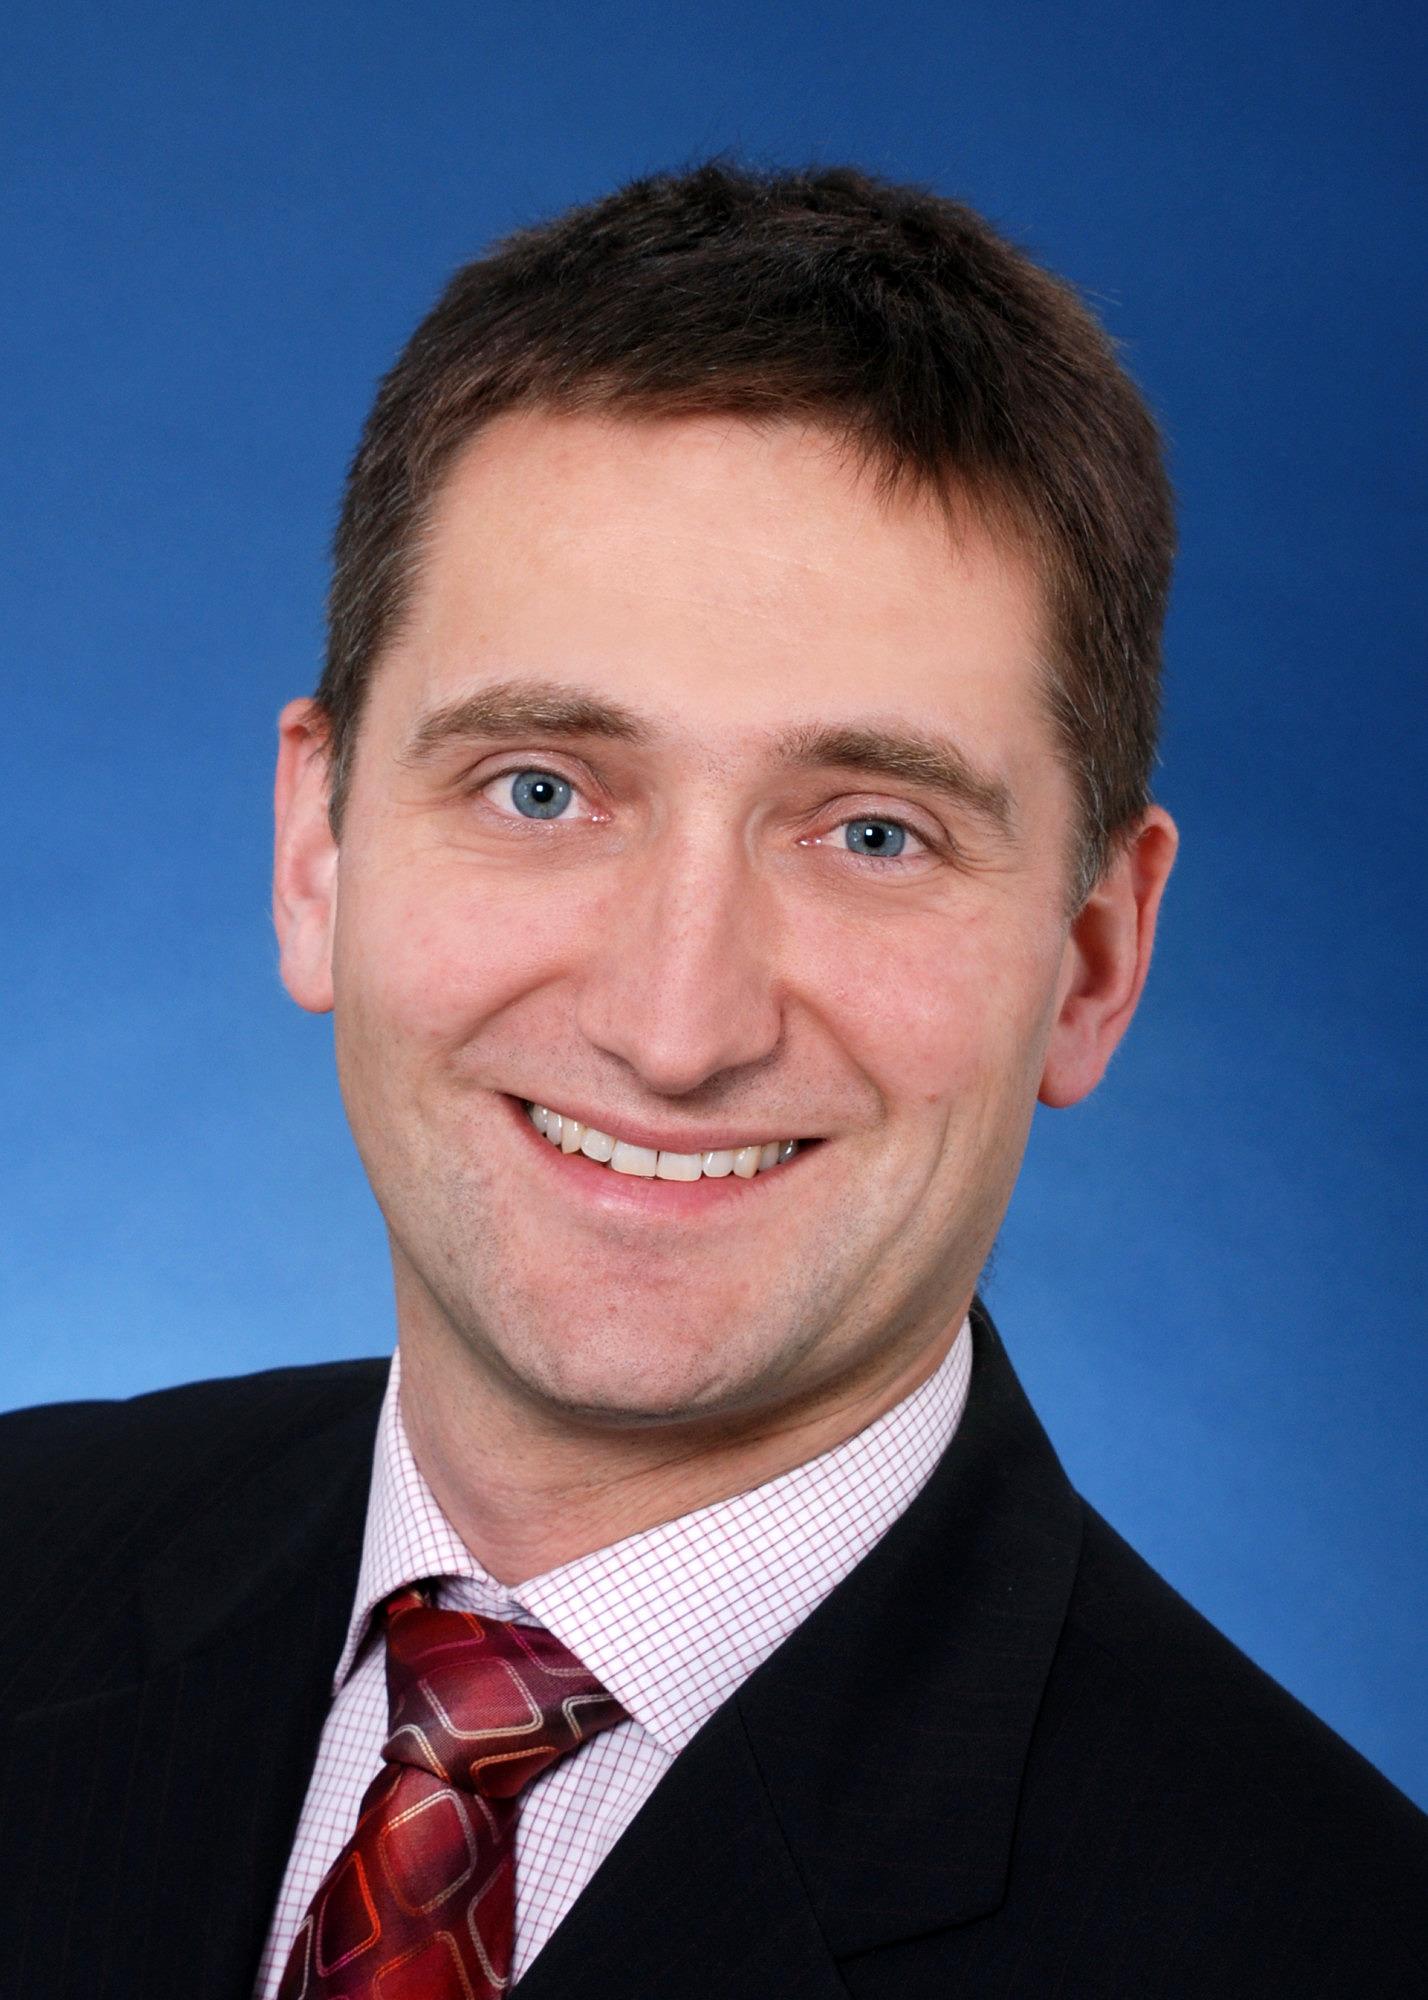 Patrick Löffler